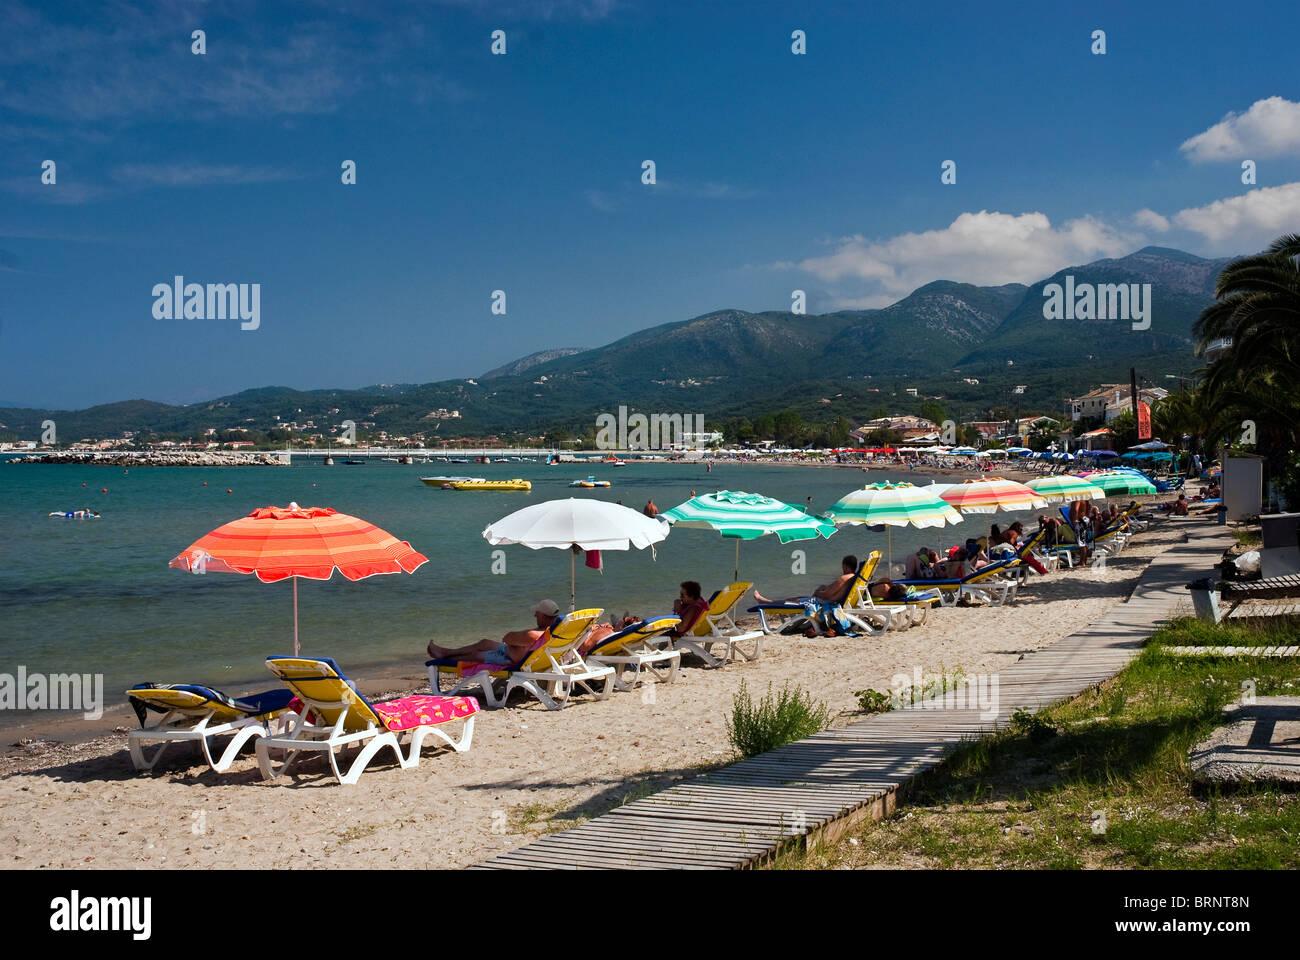 Roda Beach, Corfu, Ionian Islands Greece. - Stock Image